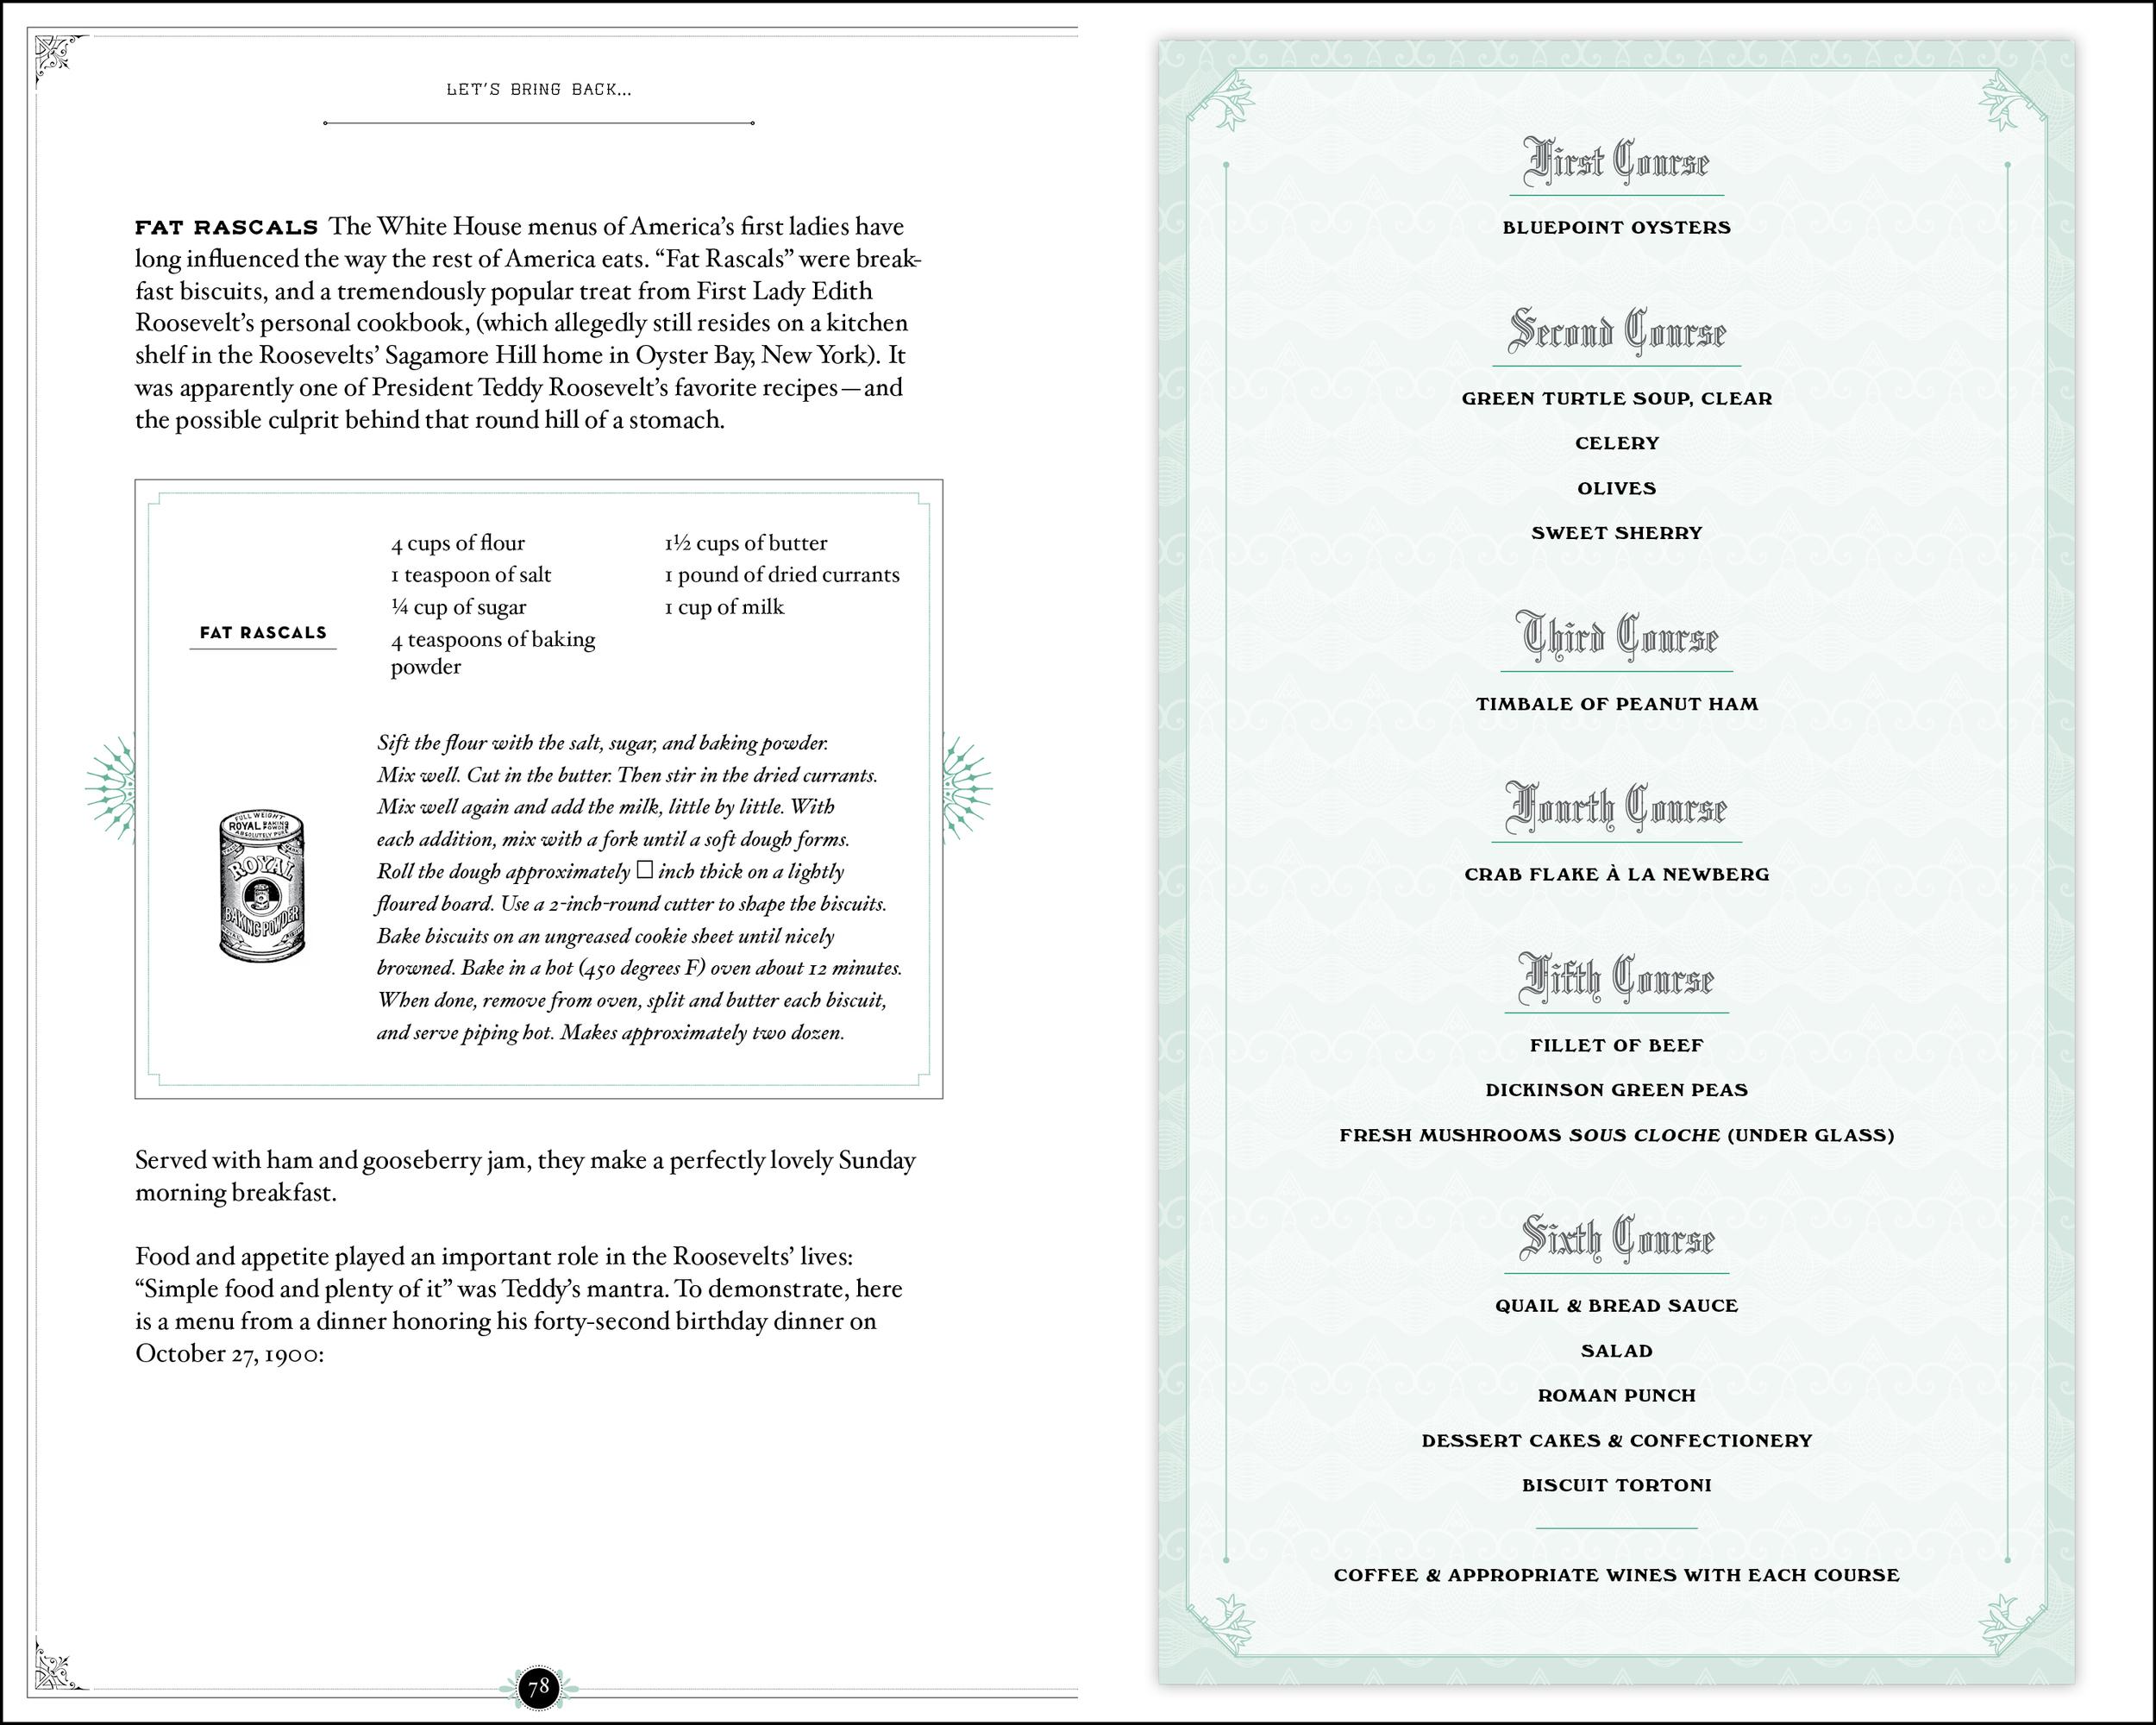 LBB1_menu-2.jpg